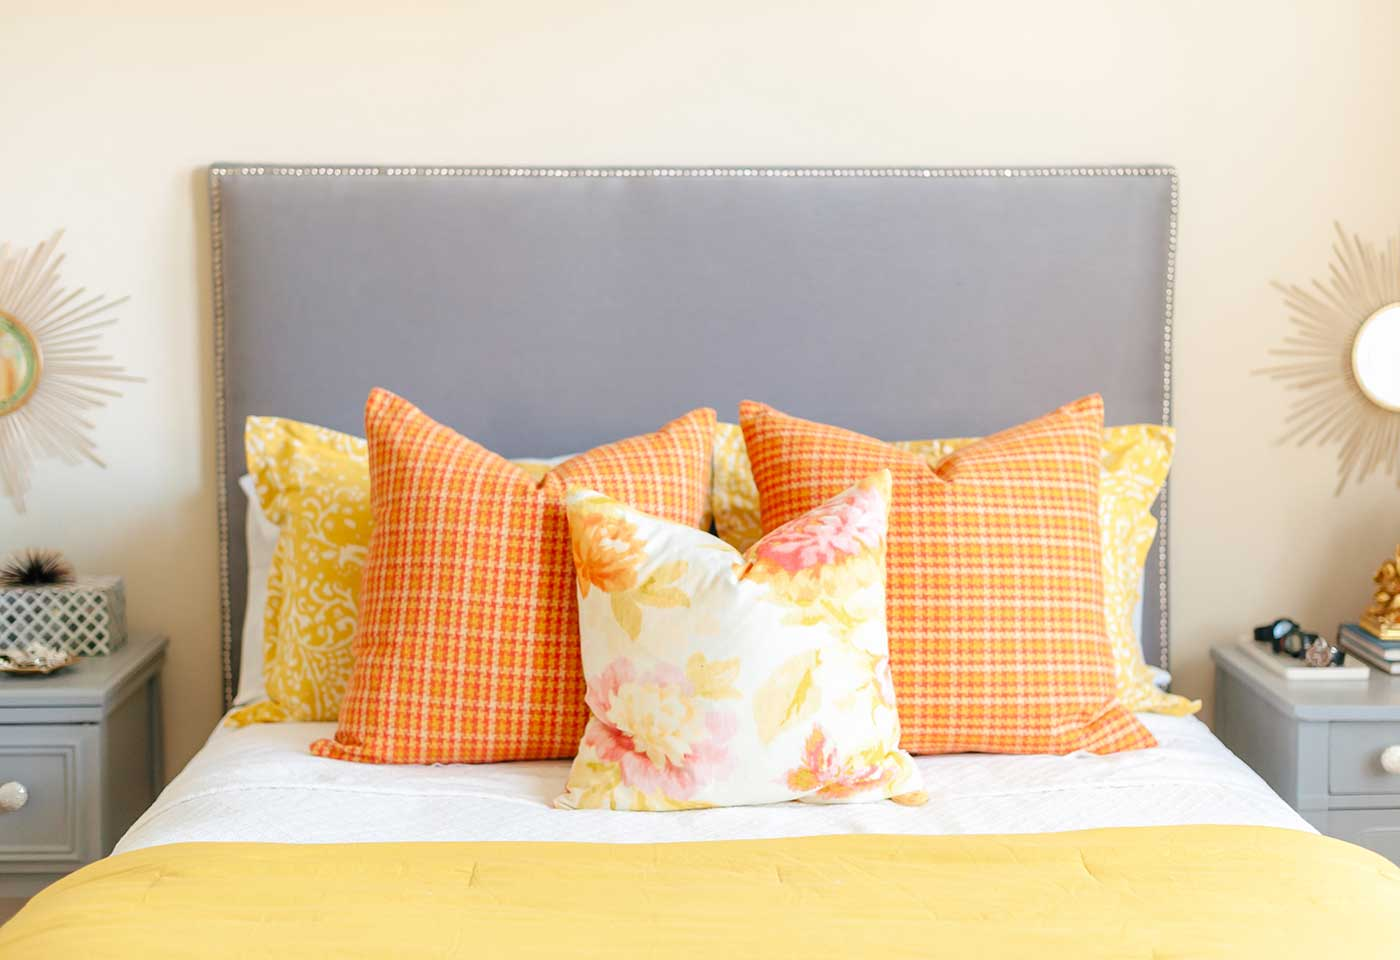 headboard-pillows-upclose2-pro.jpg